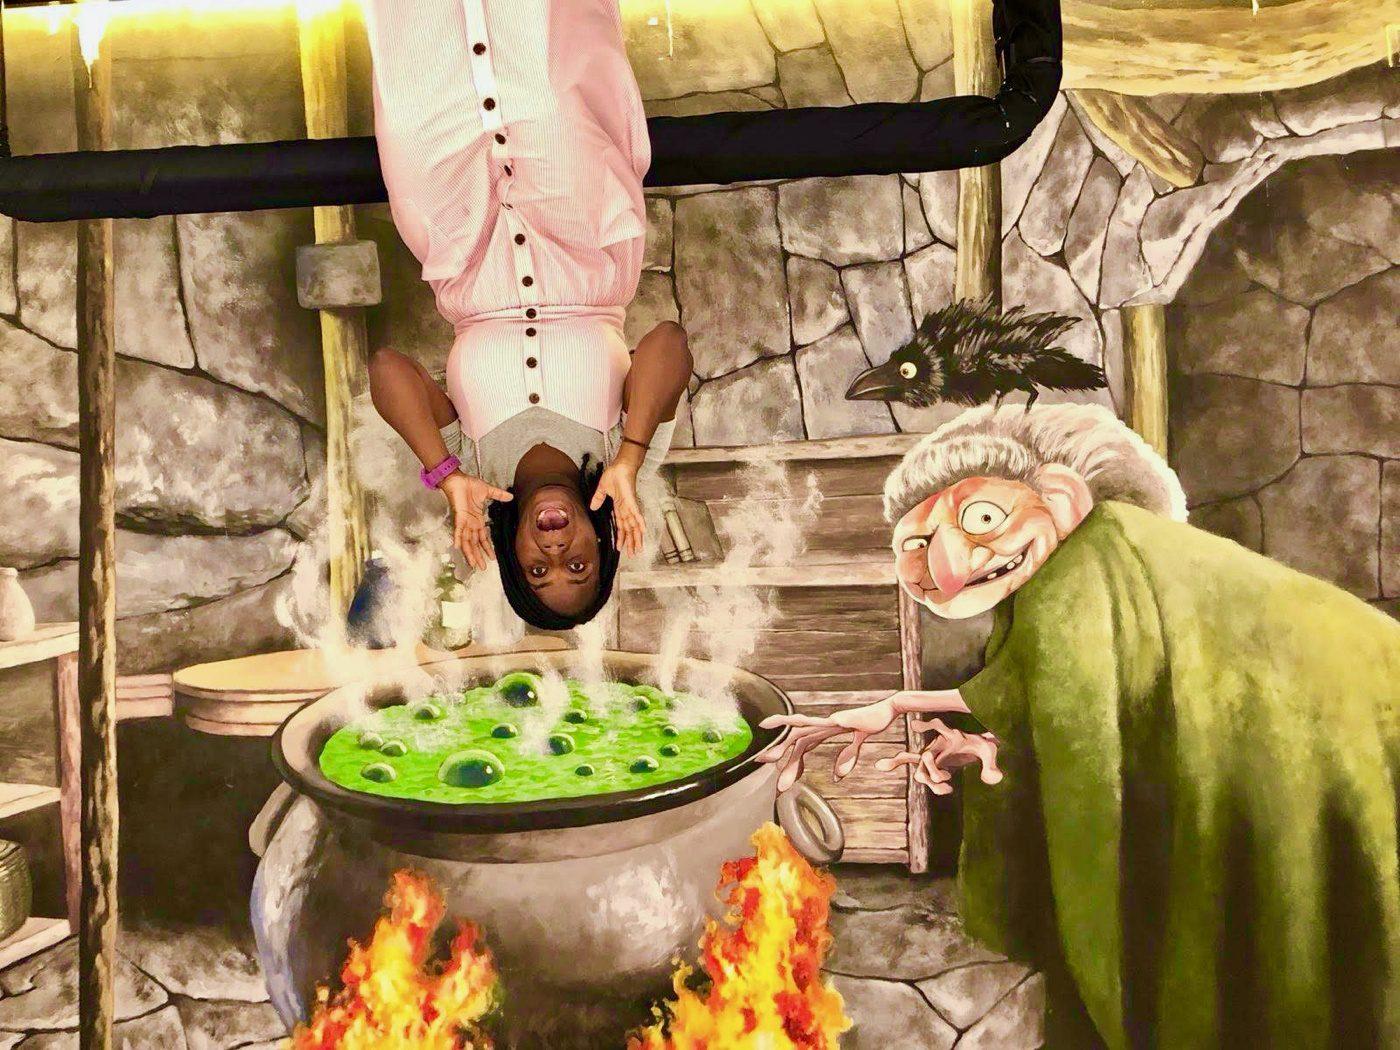 Witch cauldron upside down house